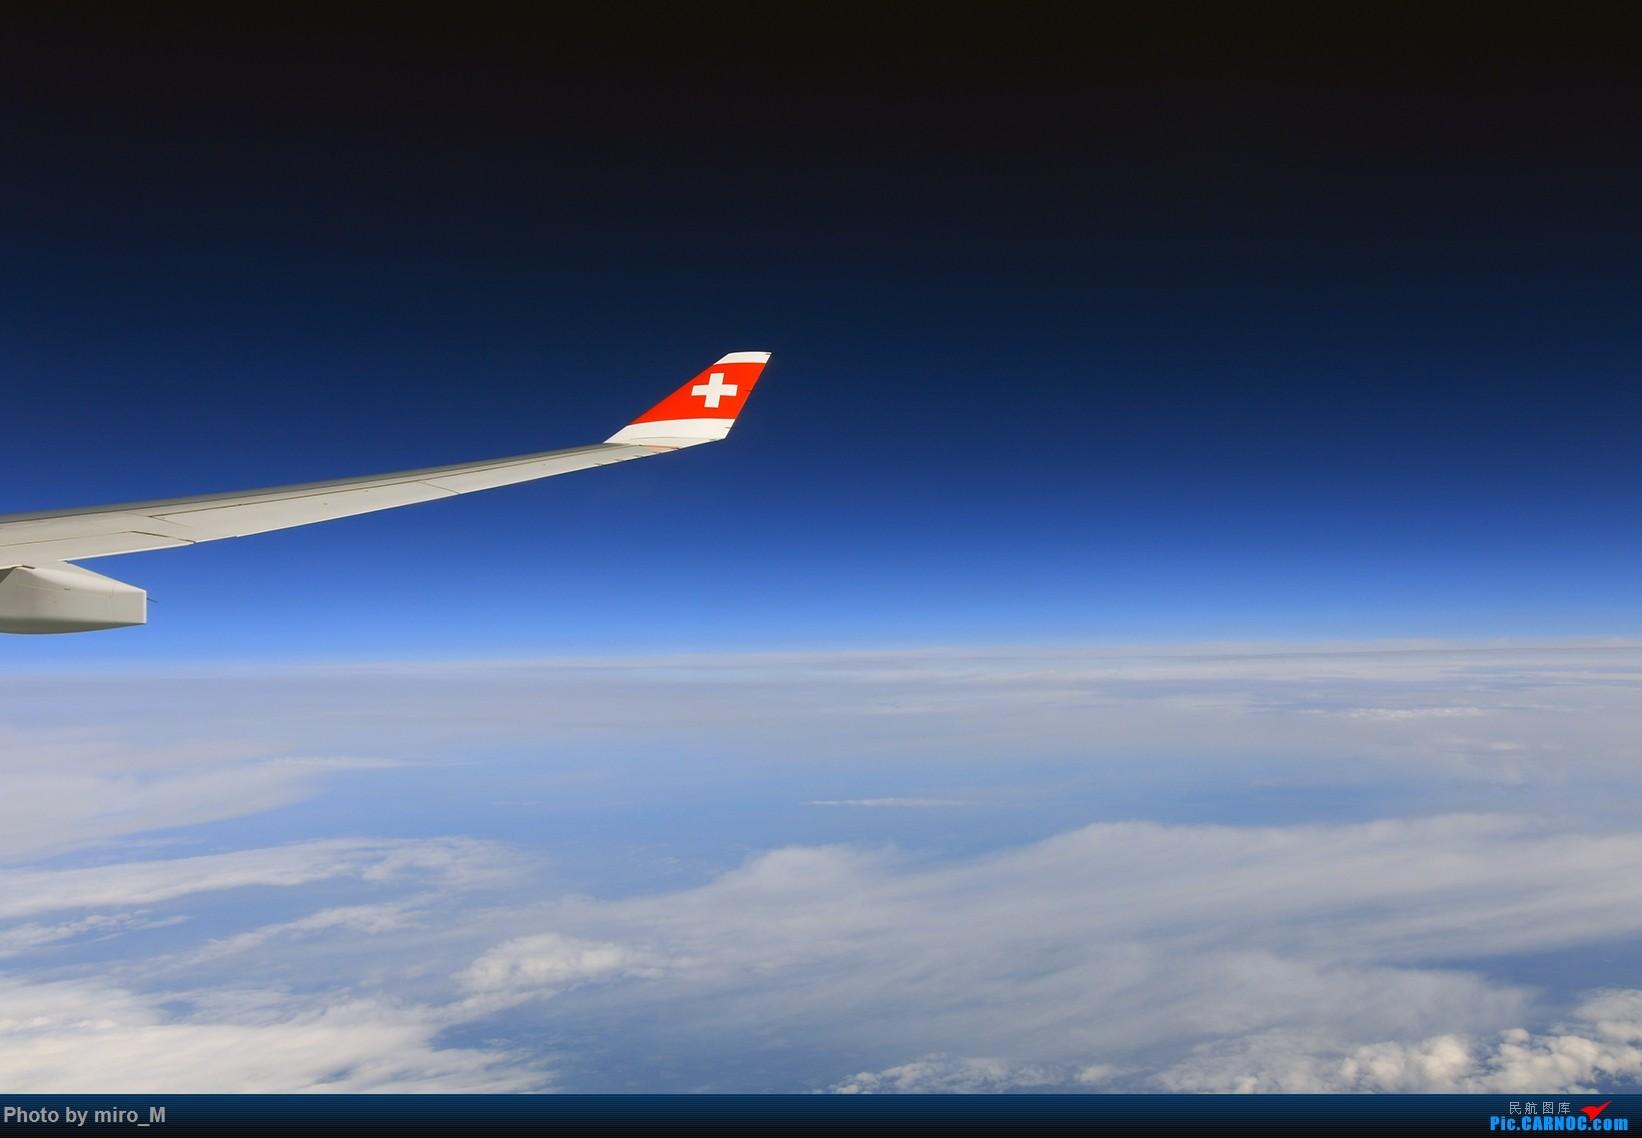 Re:[原创]欧洲浪了一圈,CS100,BAE146,fokker70等新老机型串着飞+ZRH,MUC,FRA,AMS,TLS拍机 AIRBUS A330-300 HB-JHF 中国北京首都国际机场